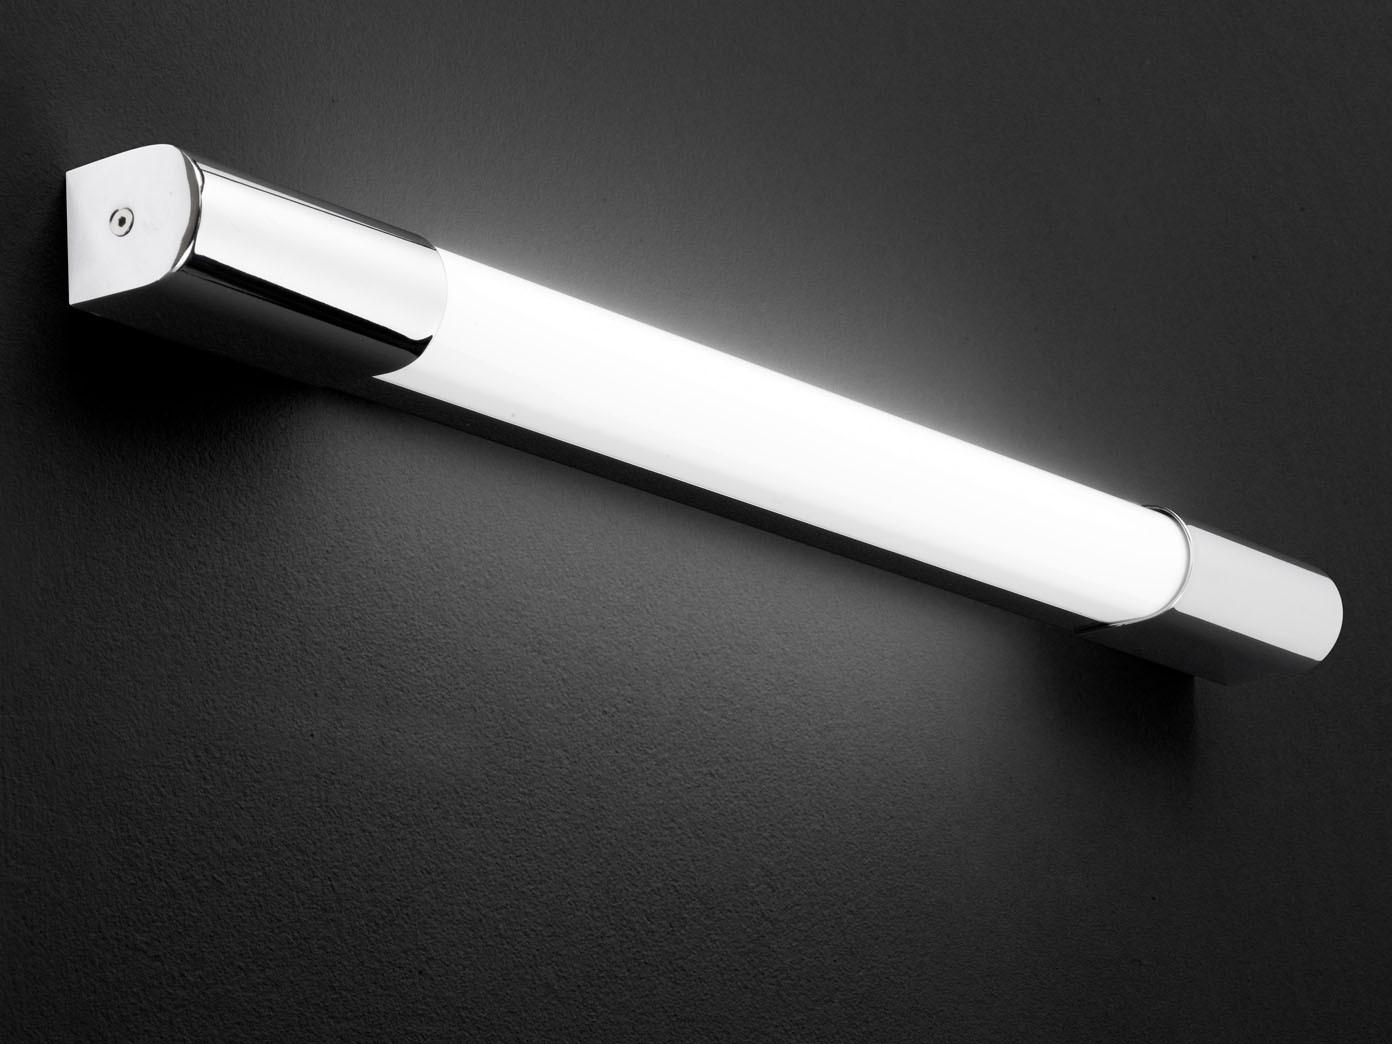 LED Badleuchte 35cm Röhre klassisch IP44 Wofi-Leuchten